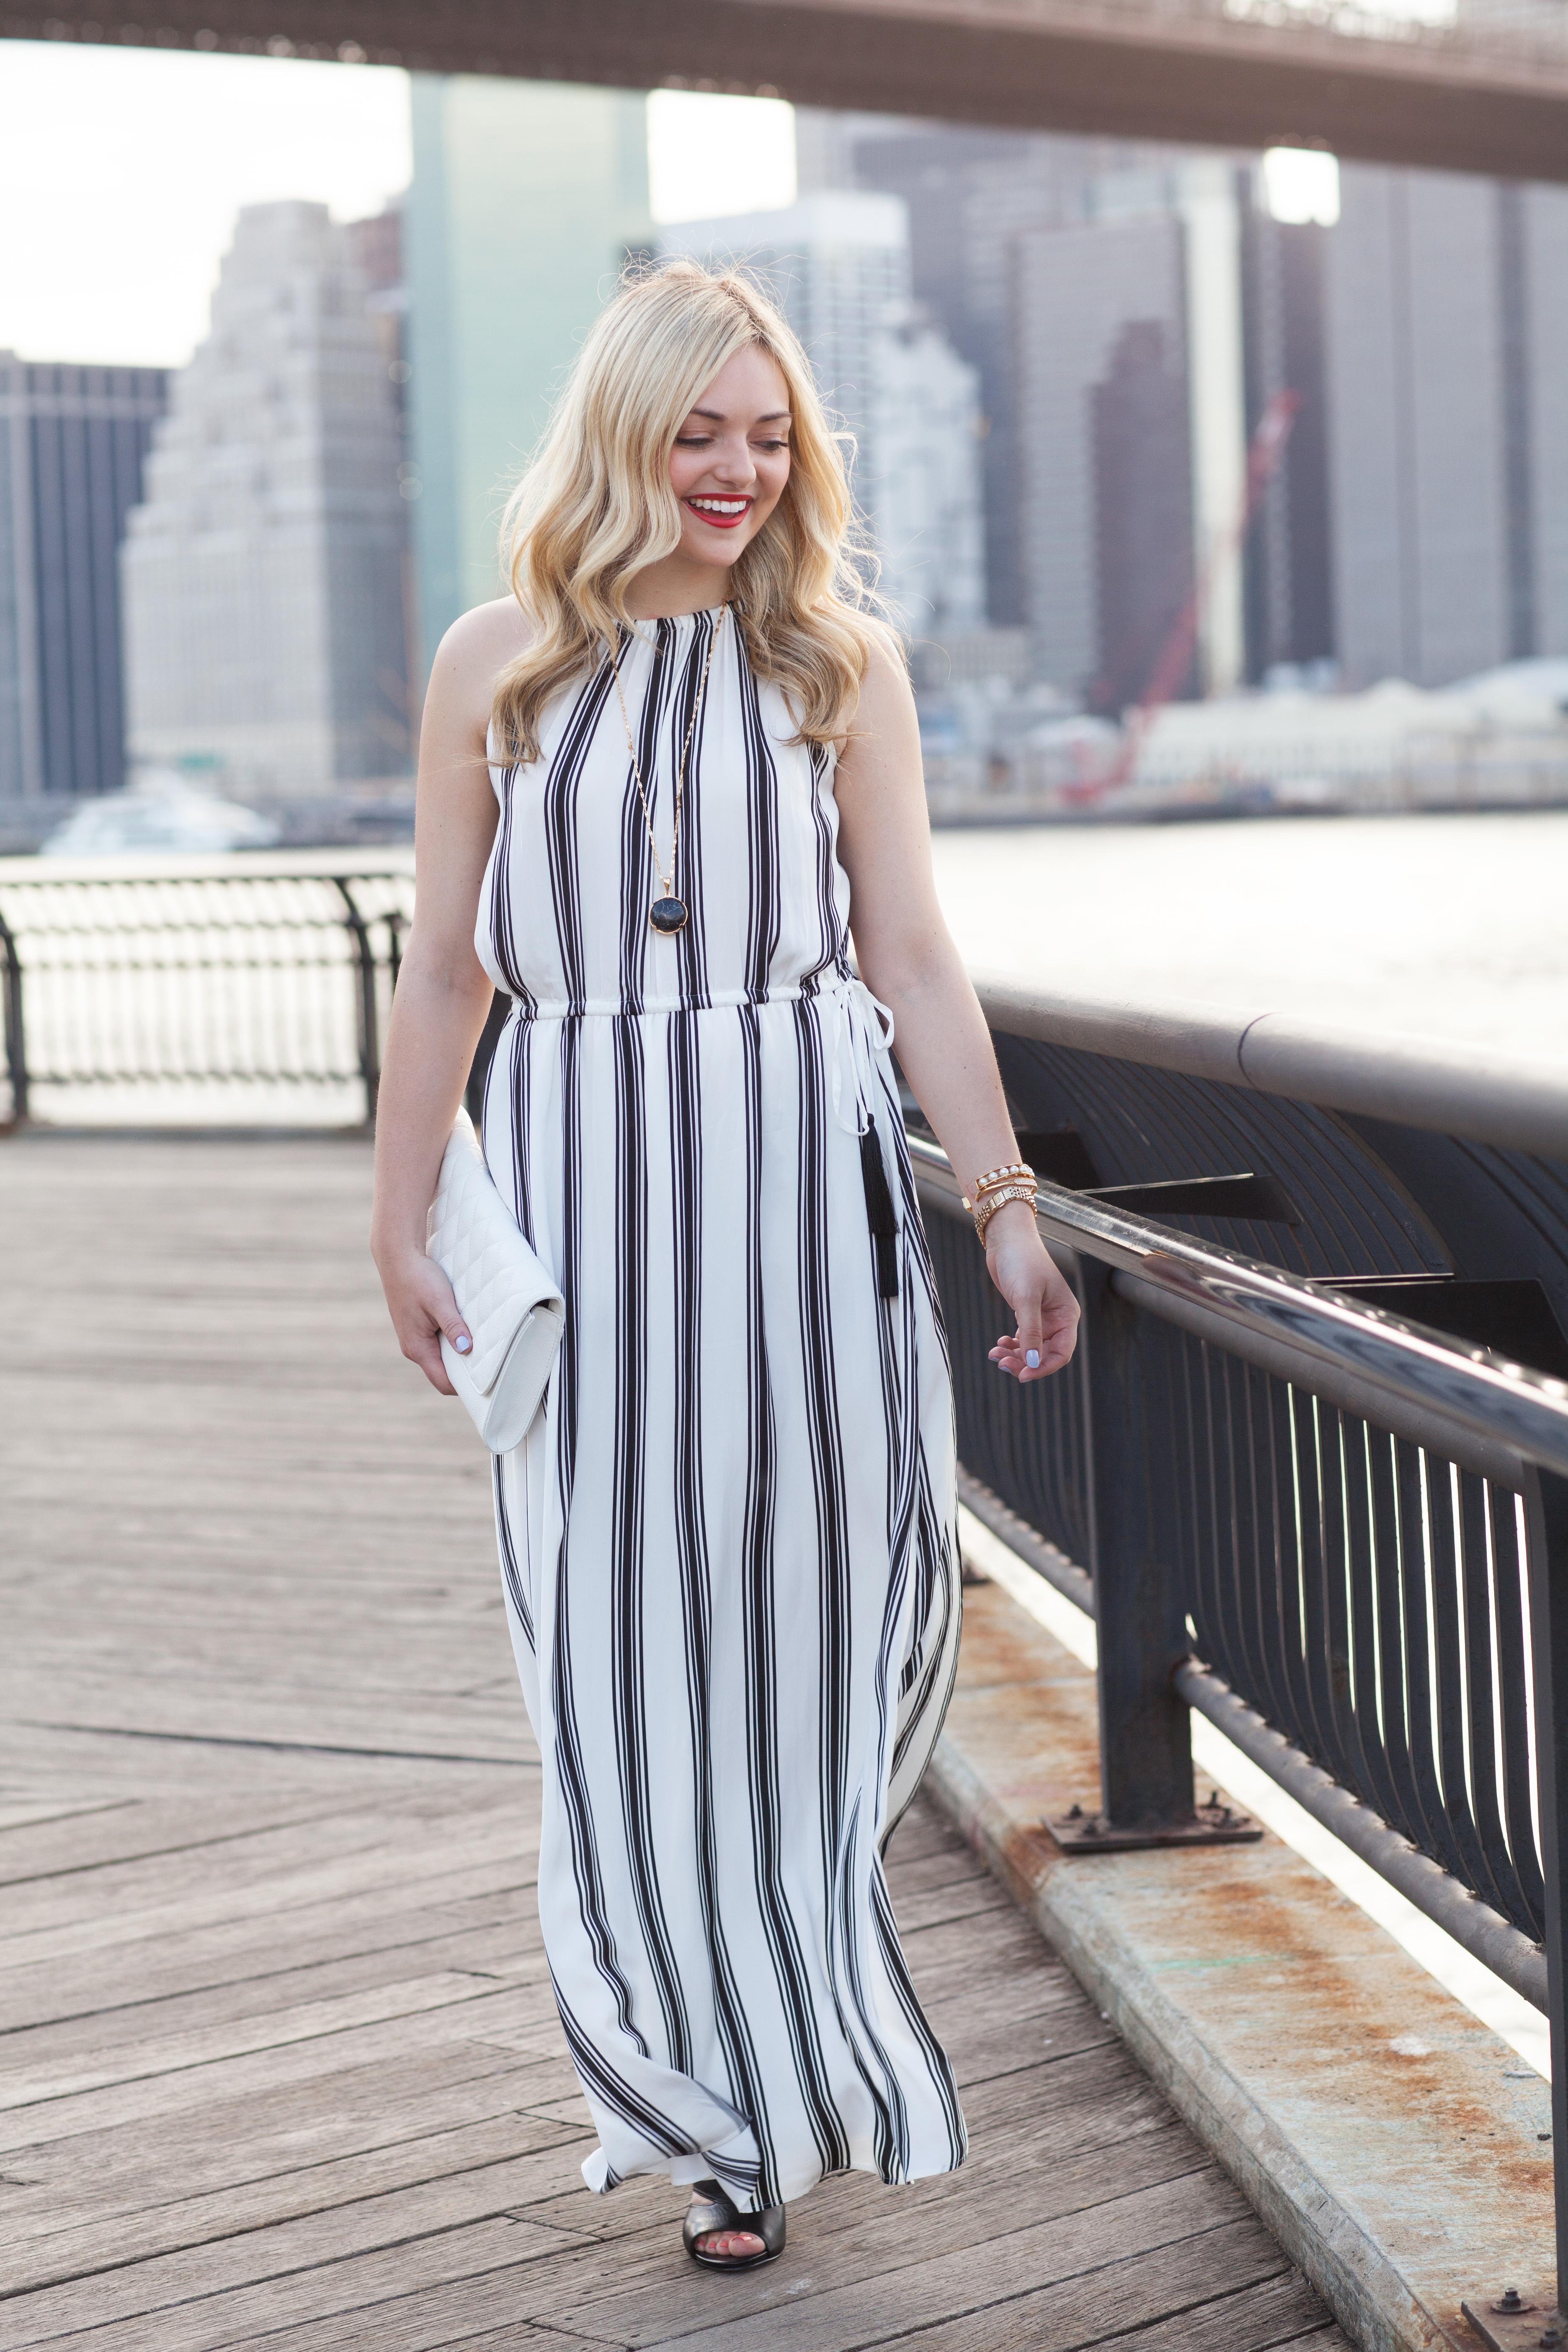 Black and grey striped maxi dresses